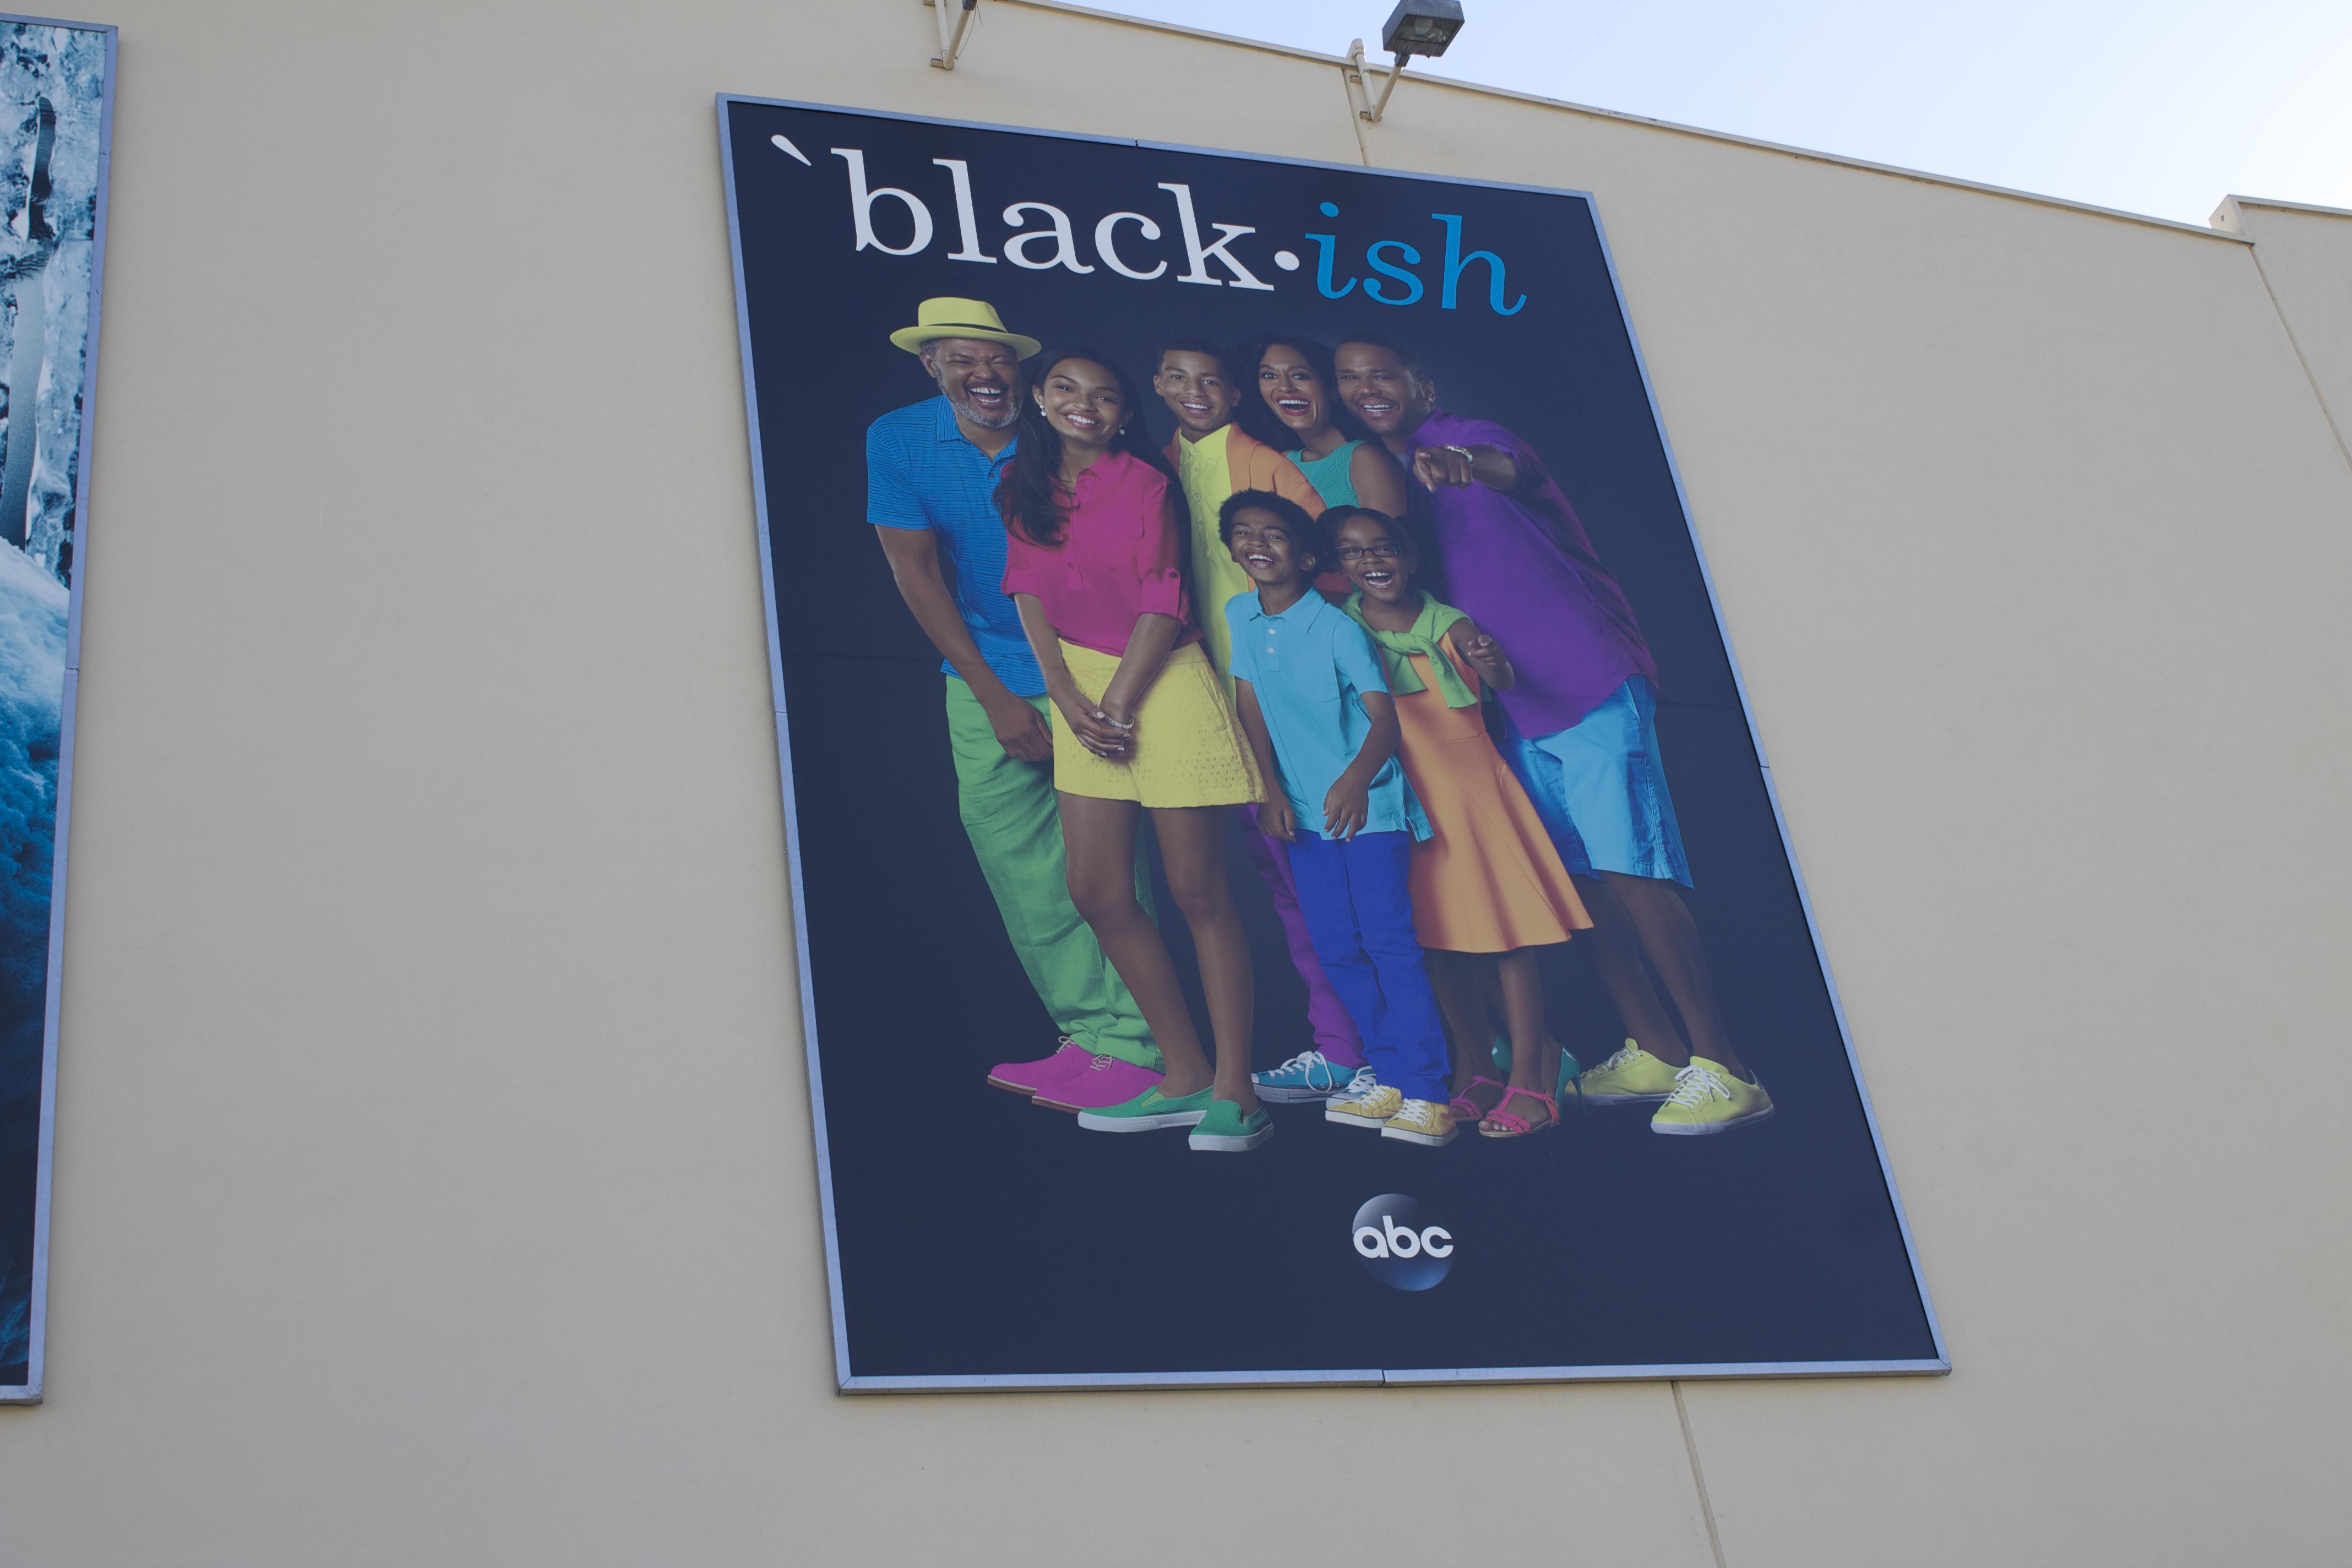 black-ish show on ABC